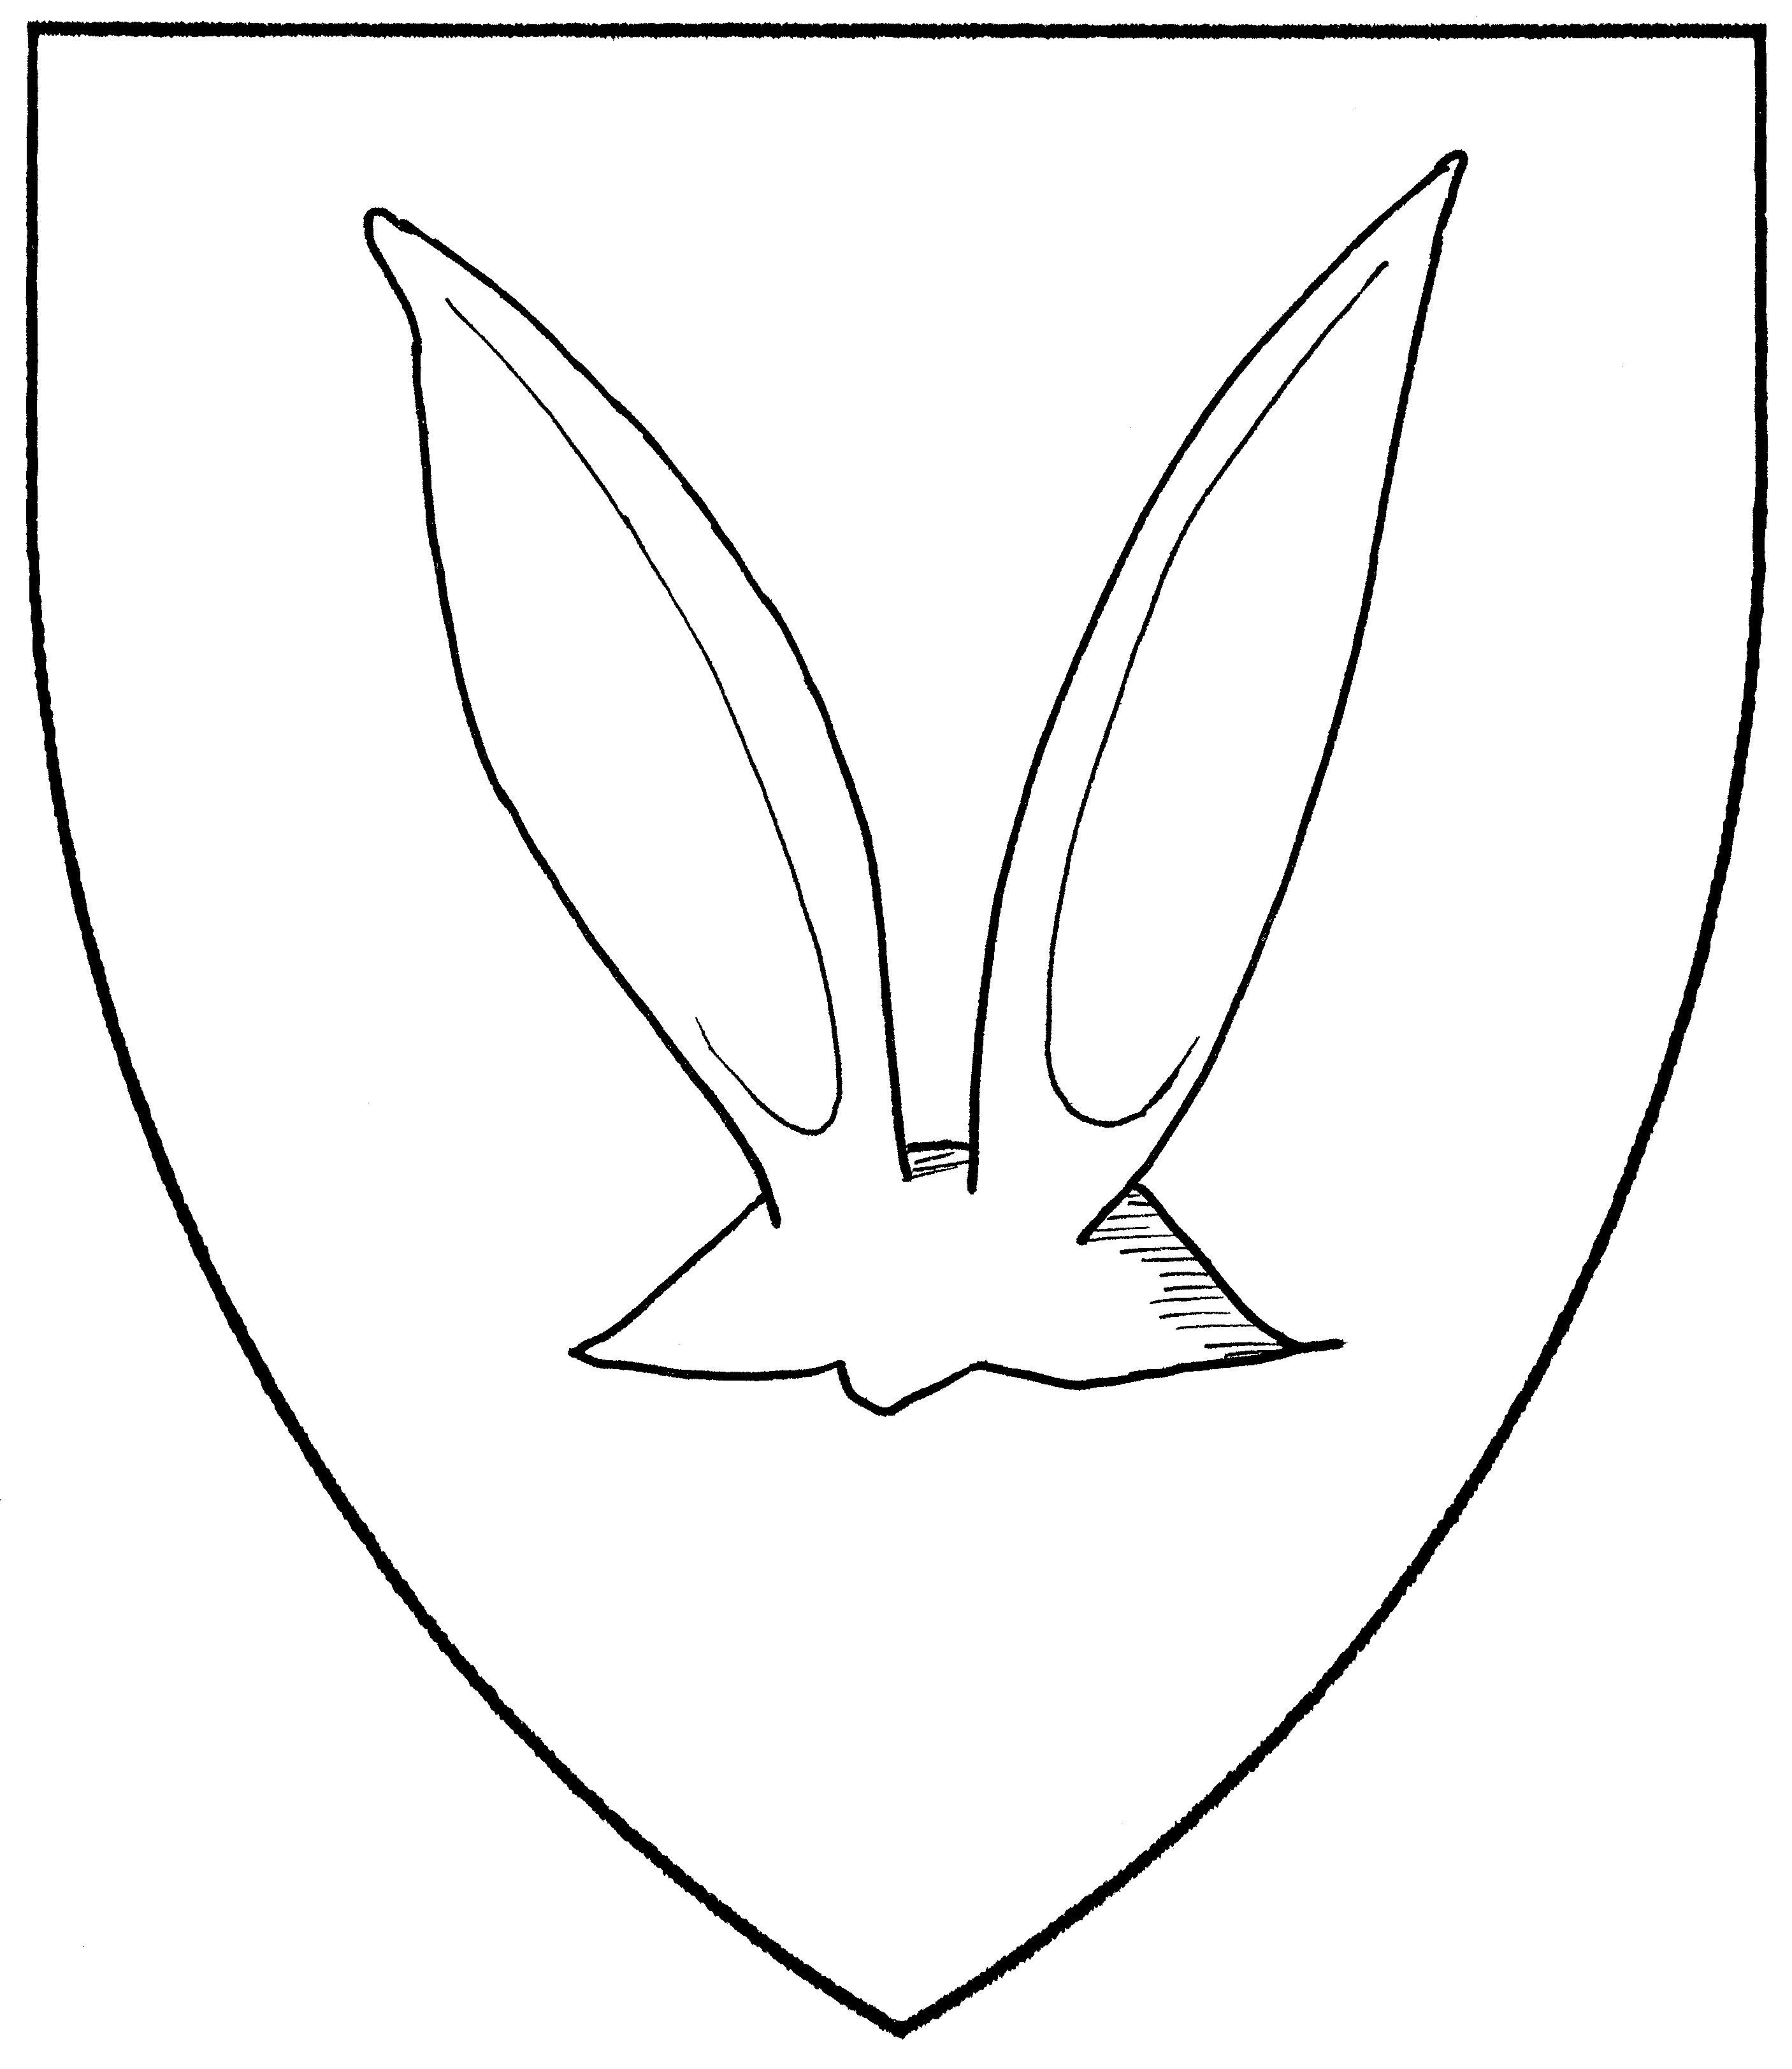 Rabbit Ears Drawing At Getdrawings